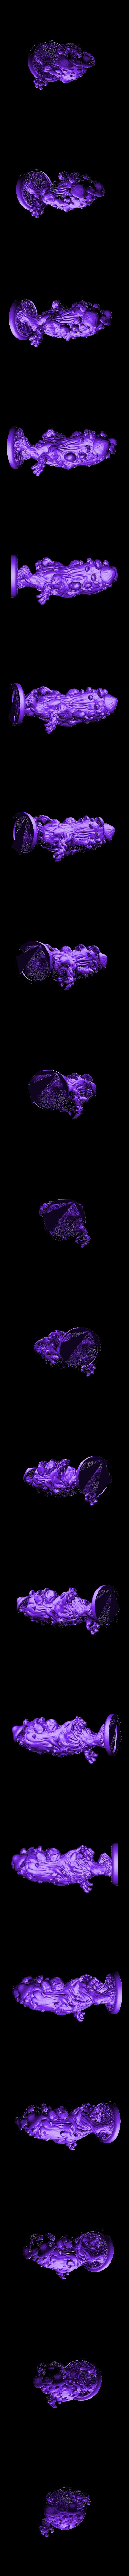 Hombre Seta 1.stl Download free STL file Custom Halfling BB Equipment (Mushroom Men) • 3D printer template, calaverd